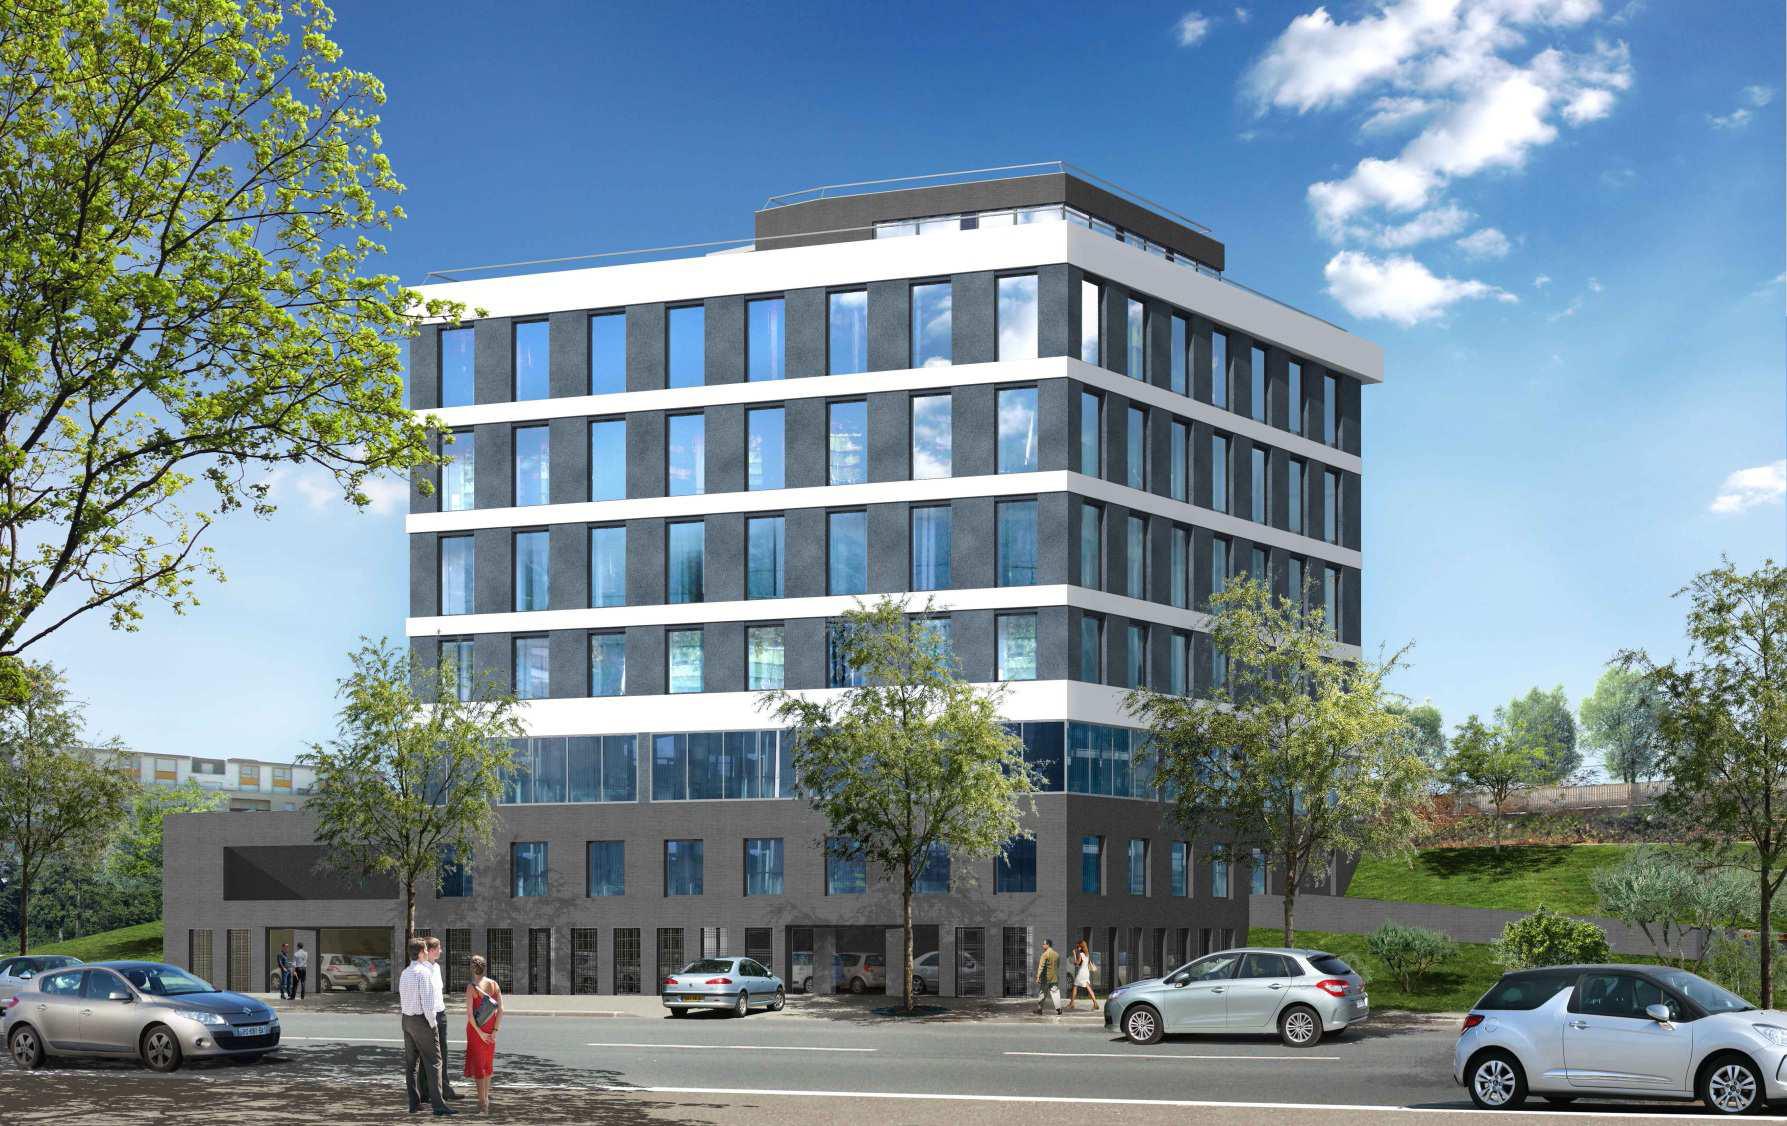 Constructions immobili res tertiaire tudiante h teli re for Immeuble bureau